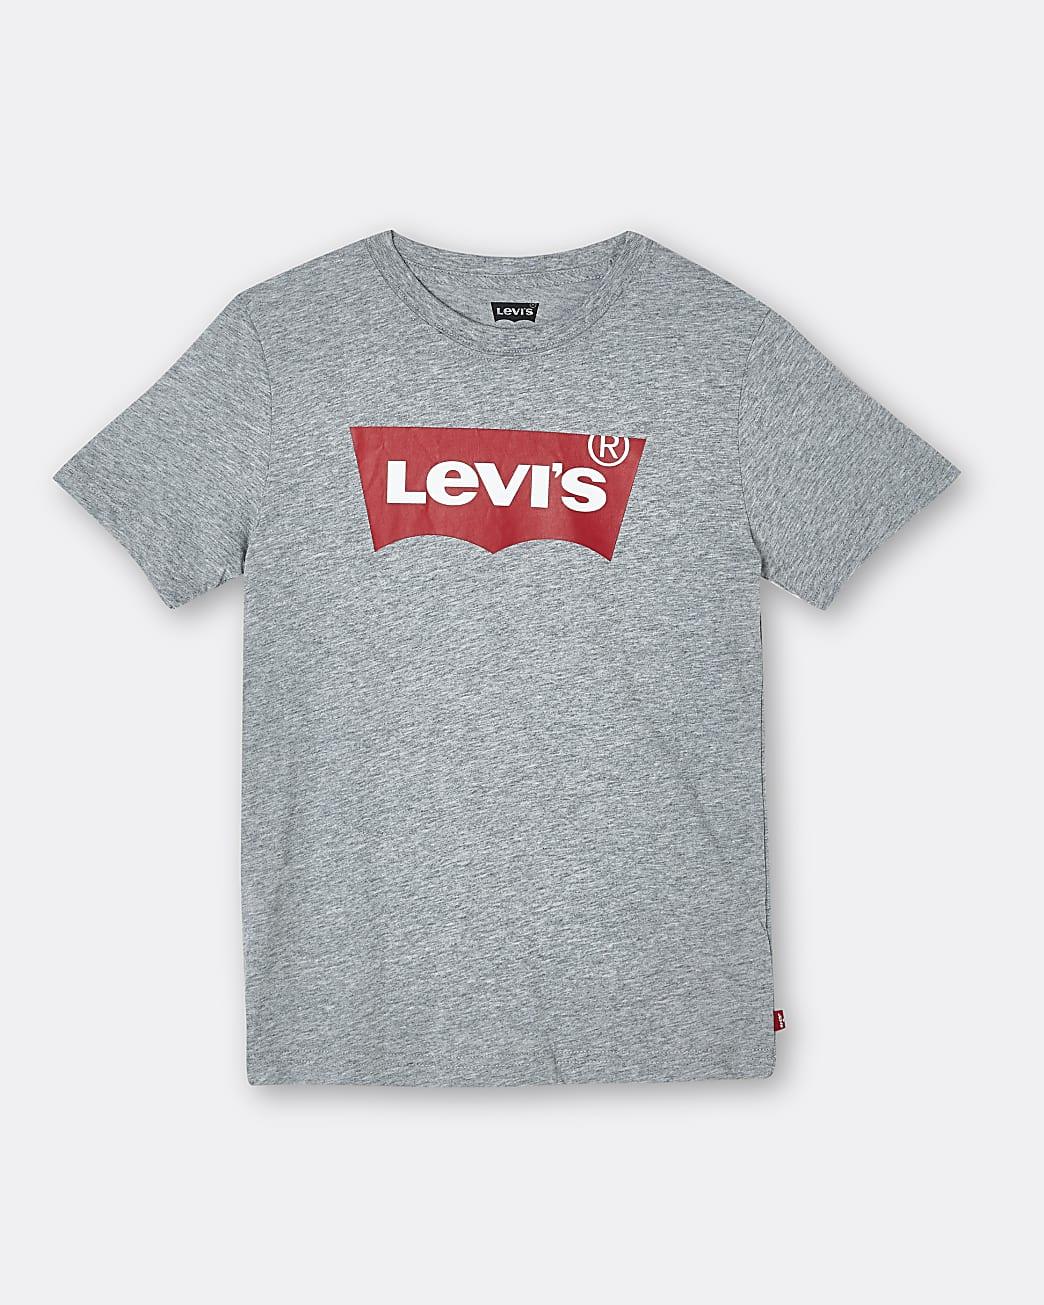 Boys grey Levi's t-shirt